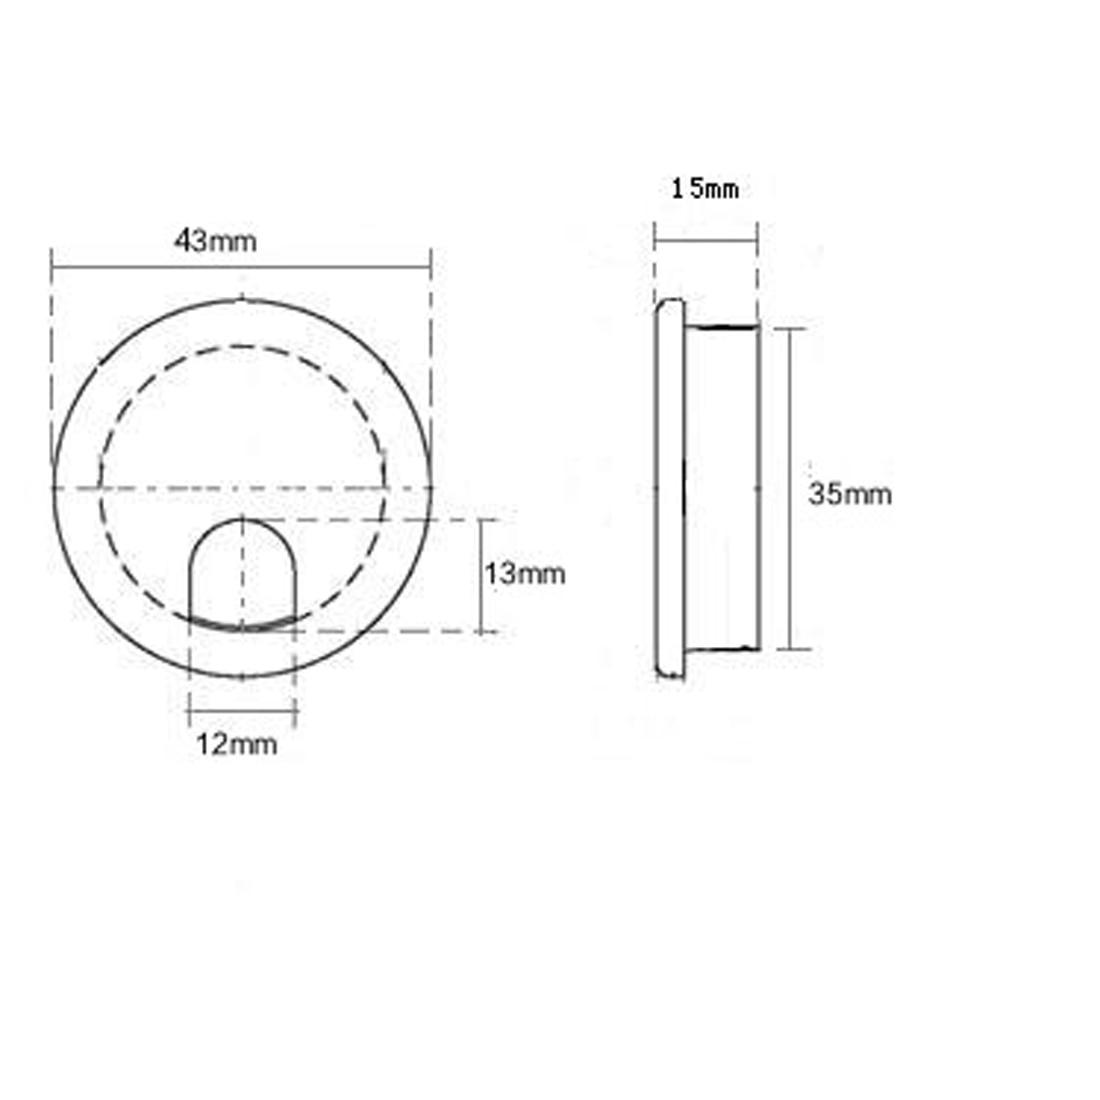 medium resolution of uxcell wiring diagram wiring diagramuxcell wiring diagram wiring diagram automotiveuxcell wiring diagram online wiring diagramuxcell wiring